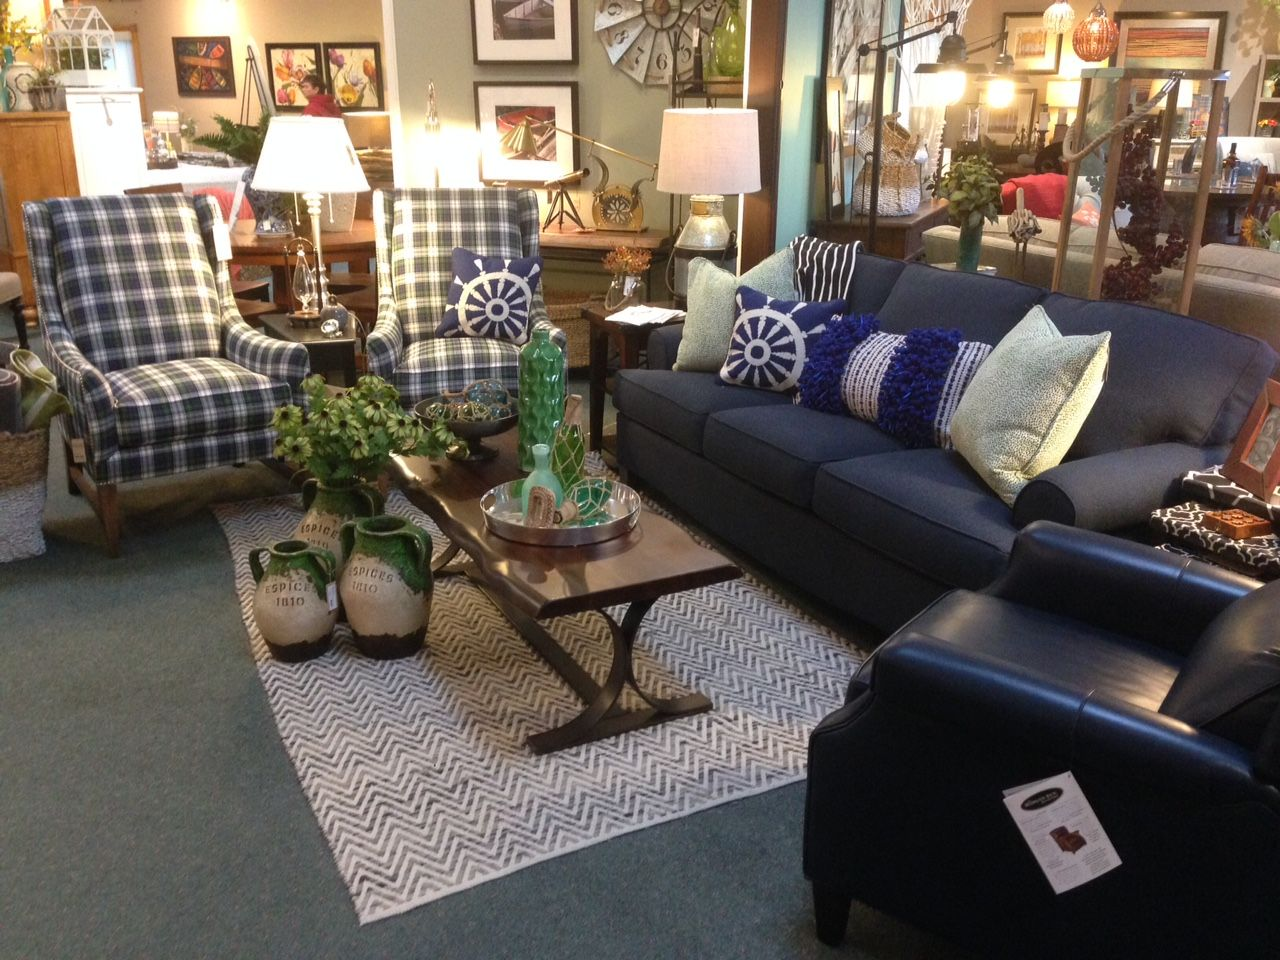 Plaid Living Room Furniture Navy Blue Sofa Plaid High Back Chairs Flat Weave Chevron Area